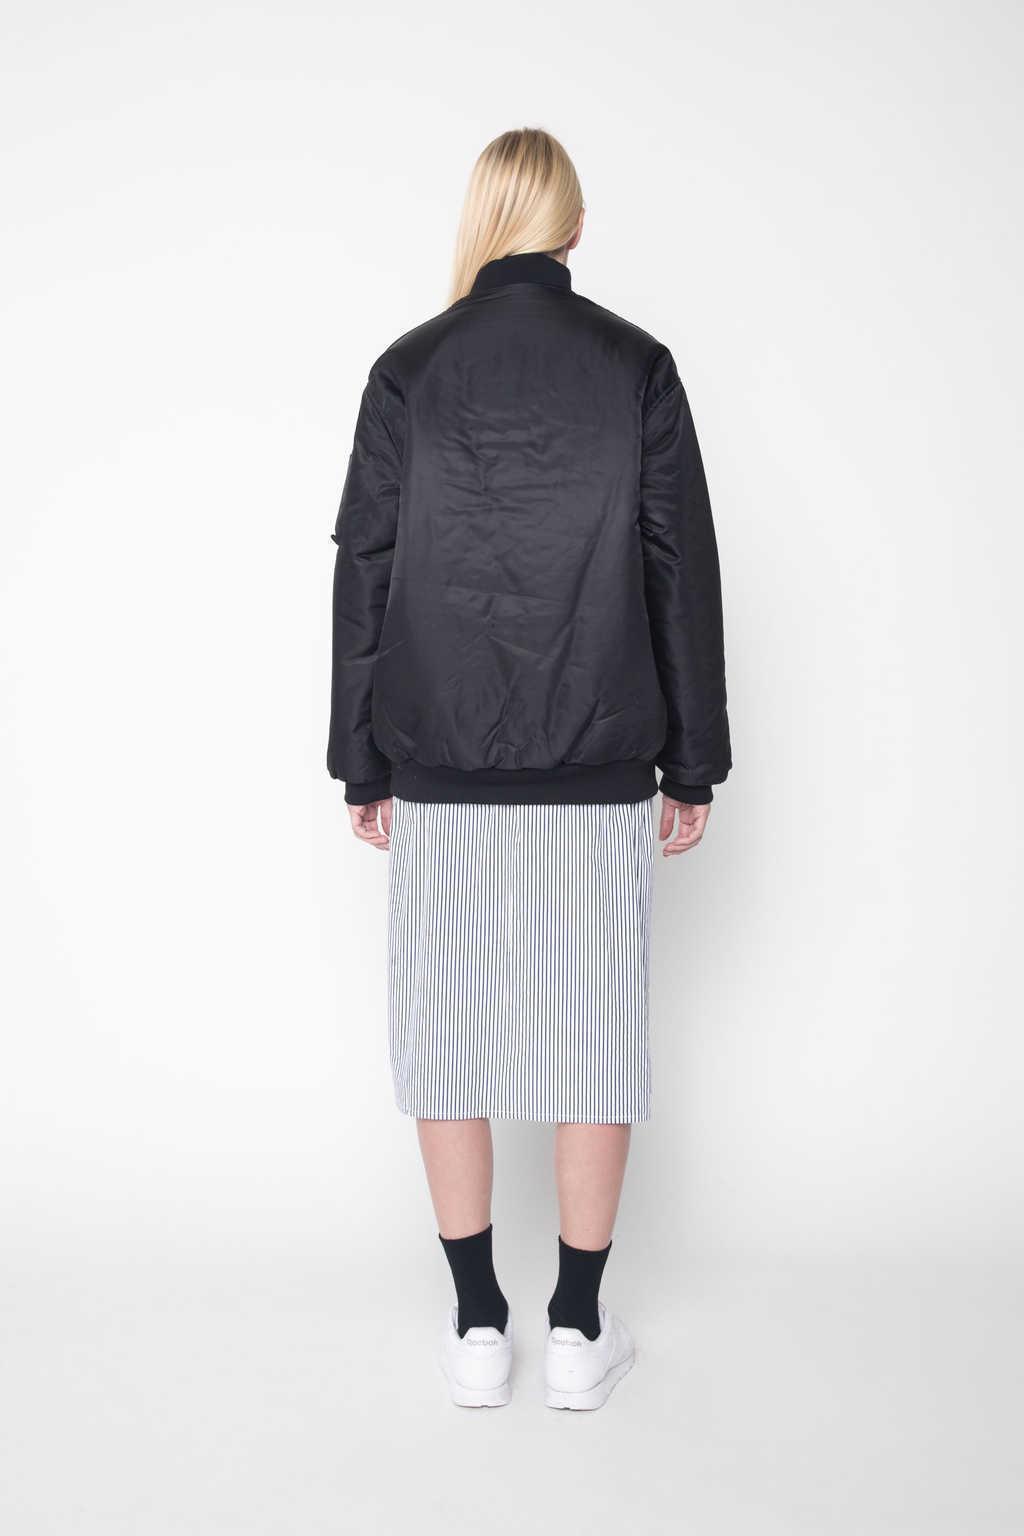 Jacket G33 Black 4